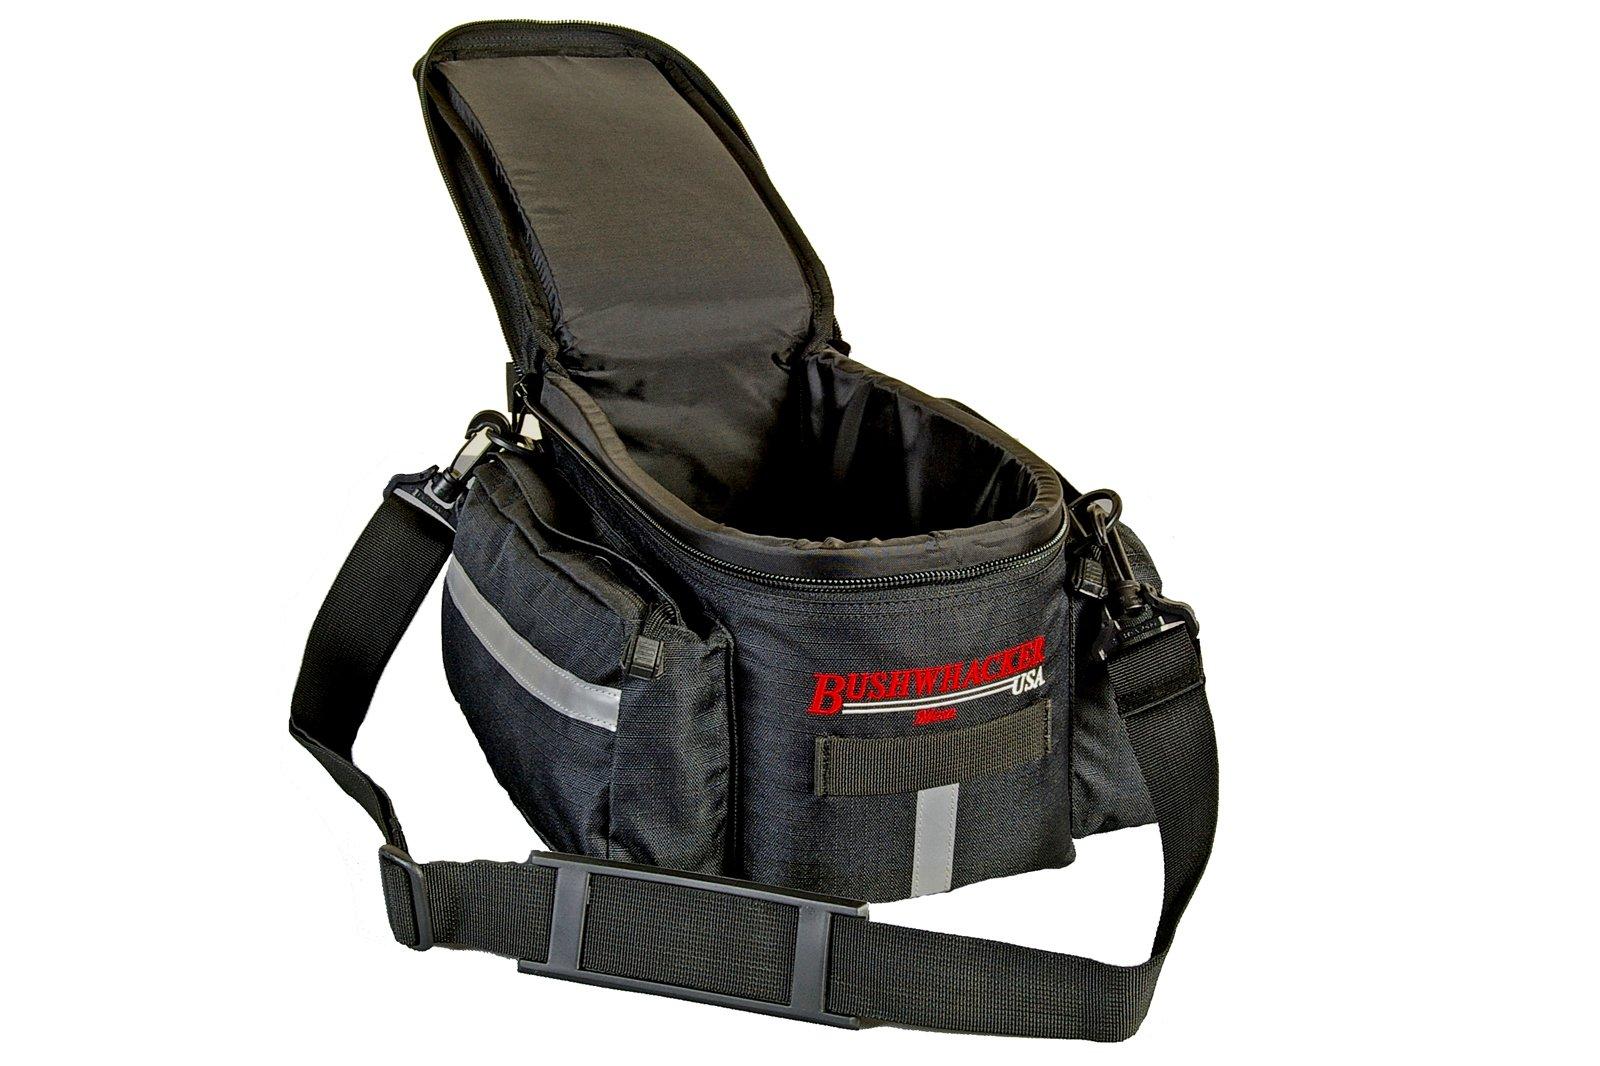 Bushwhacker® Mesa Trunk Bag Black - w/ Rear Light Clip Attachment & Reflective Trim - Bicycle Trunk Bag Cycling Rack Pack Bike Rear Bag by Bushwhacker (Image #3)